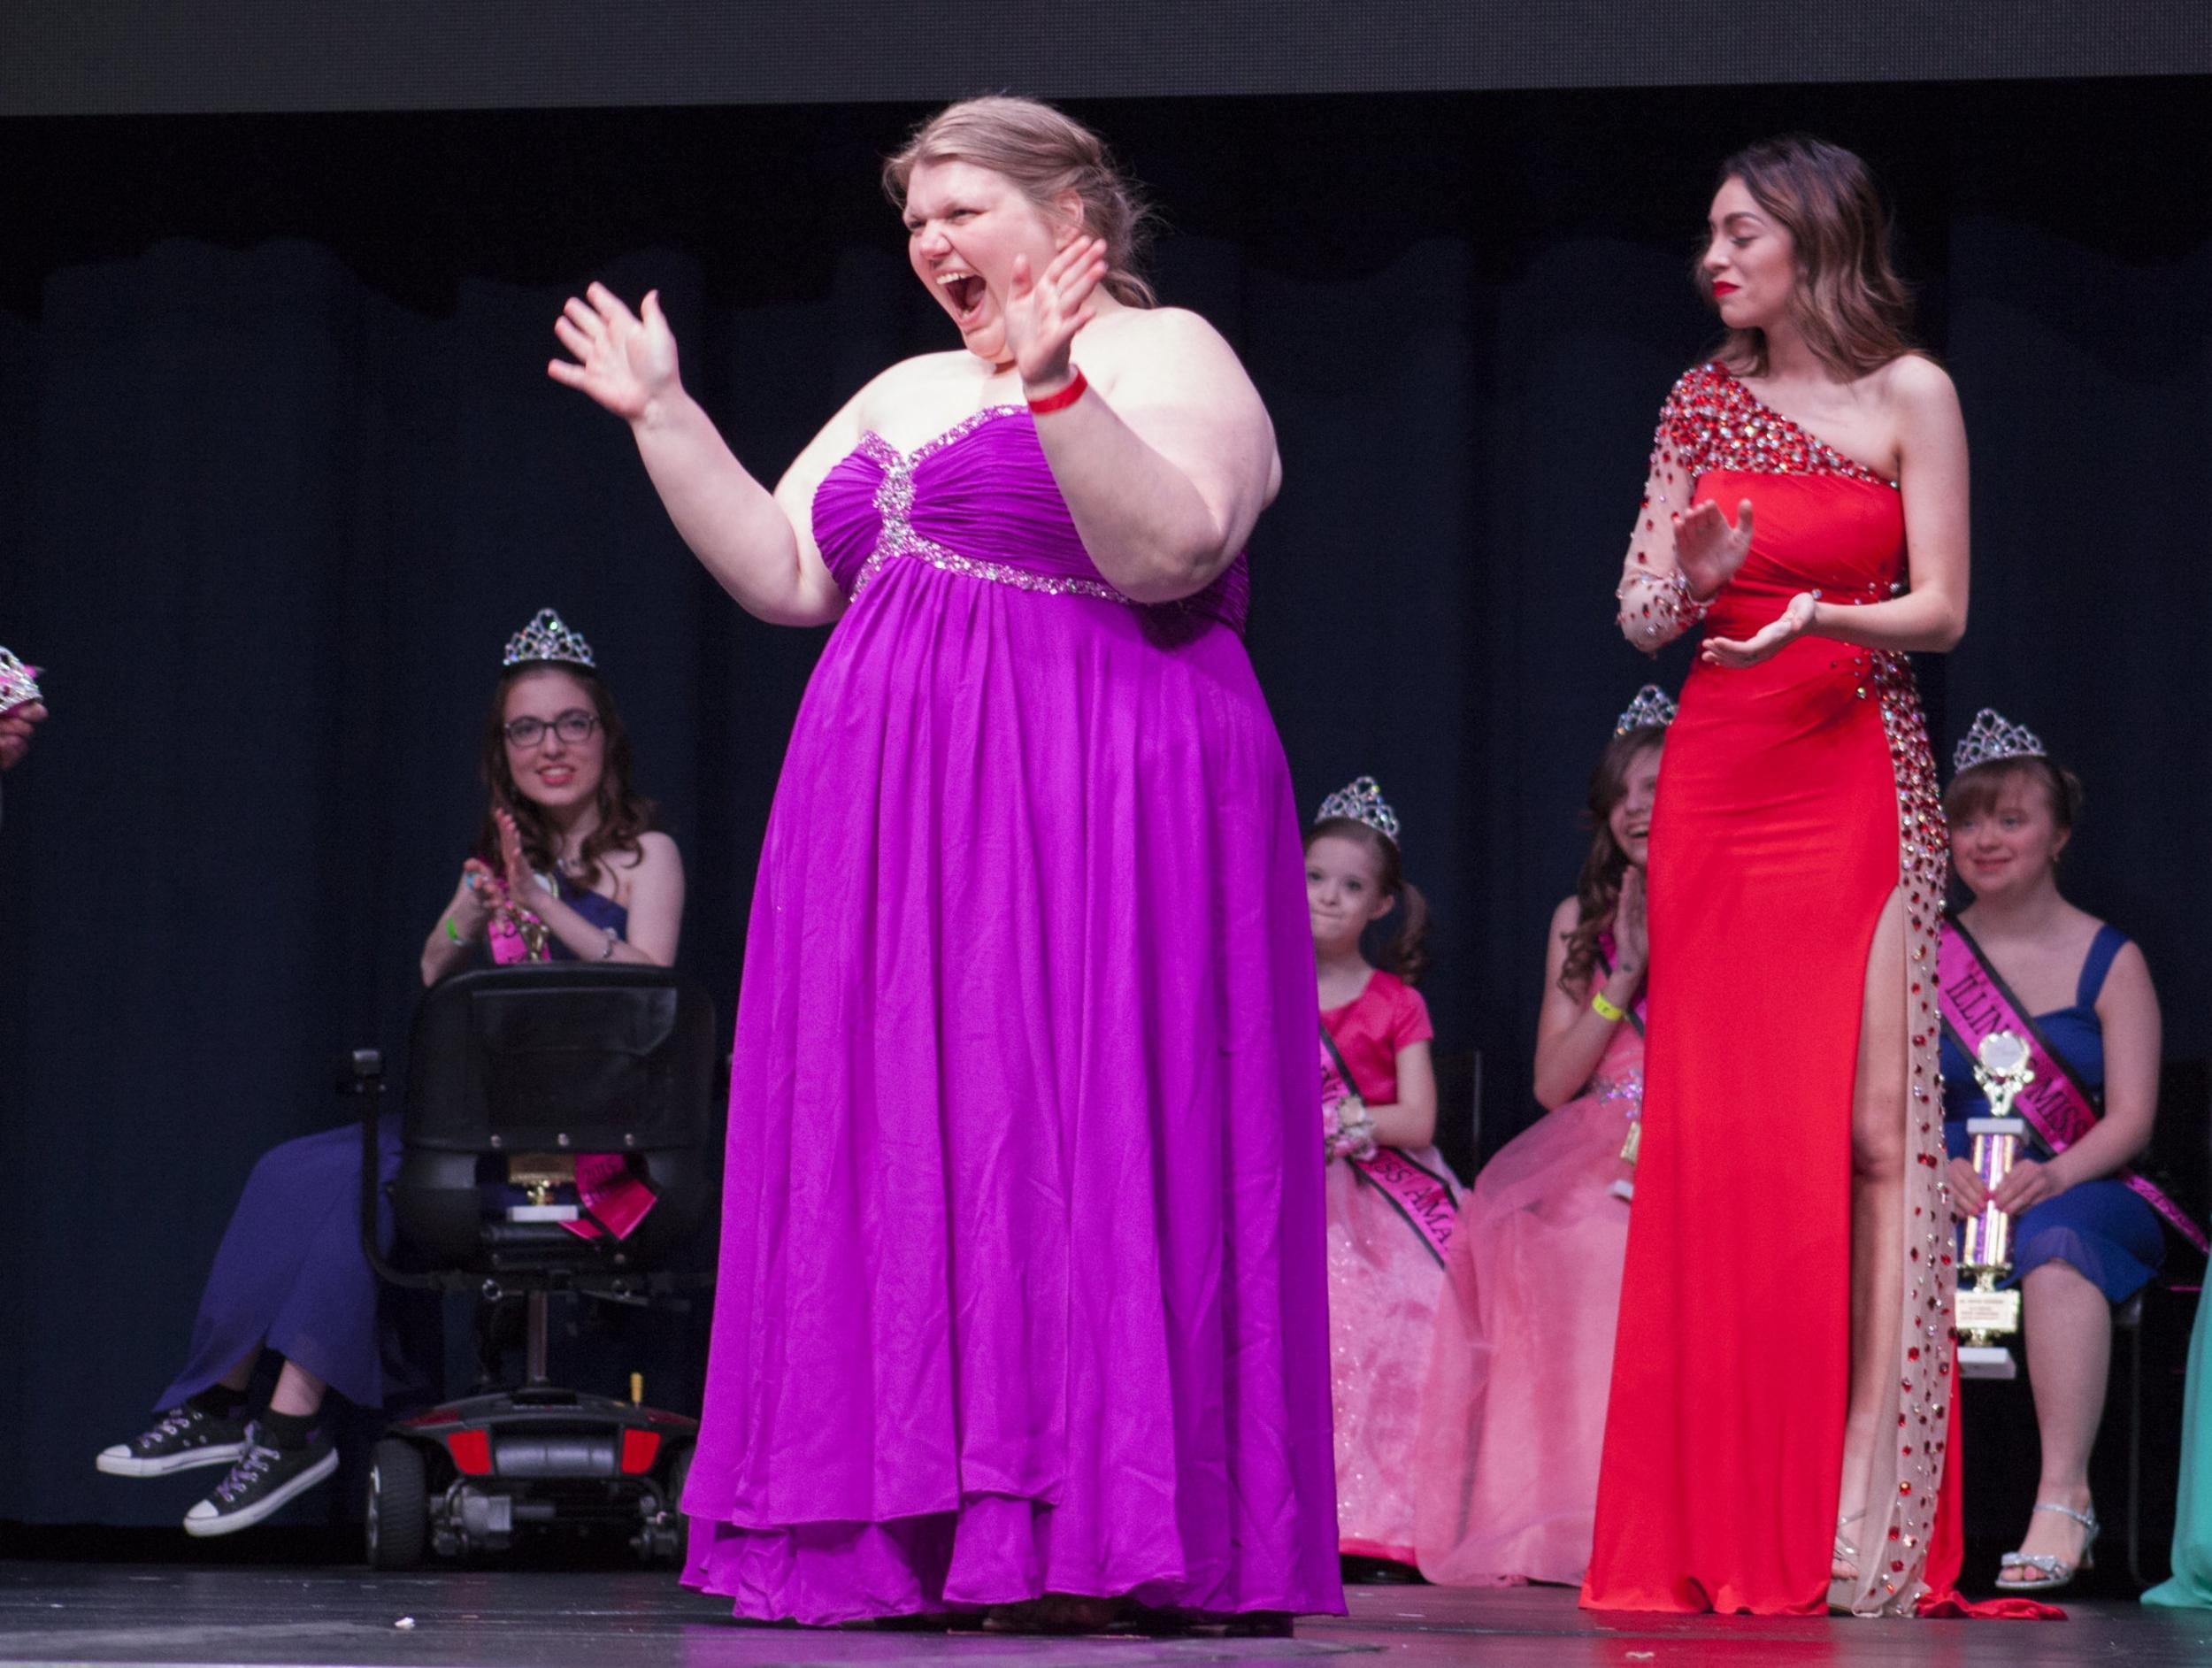 Illinois Miss Amazing 2015-Formal Event-0221.jpg